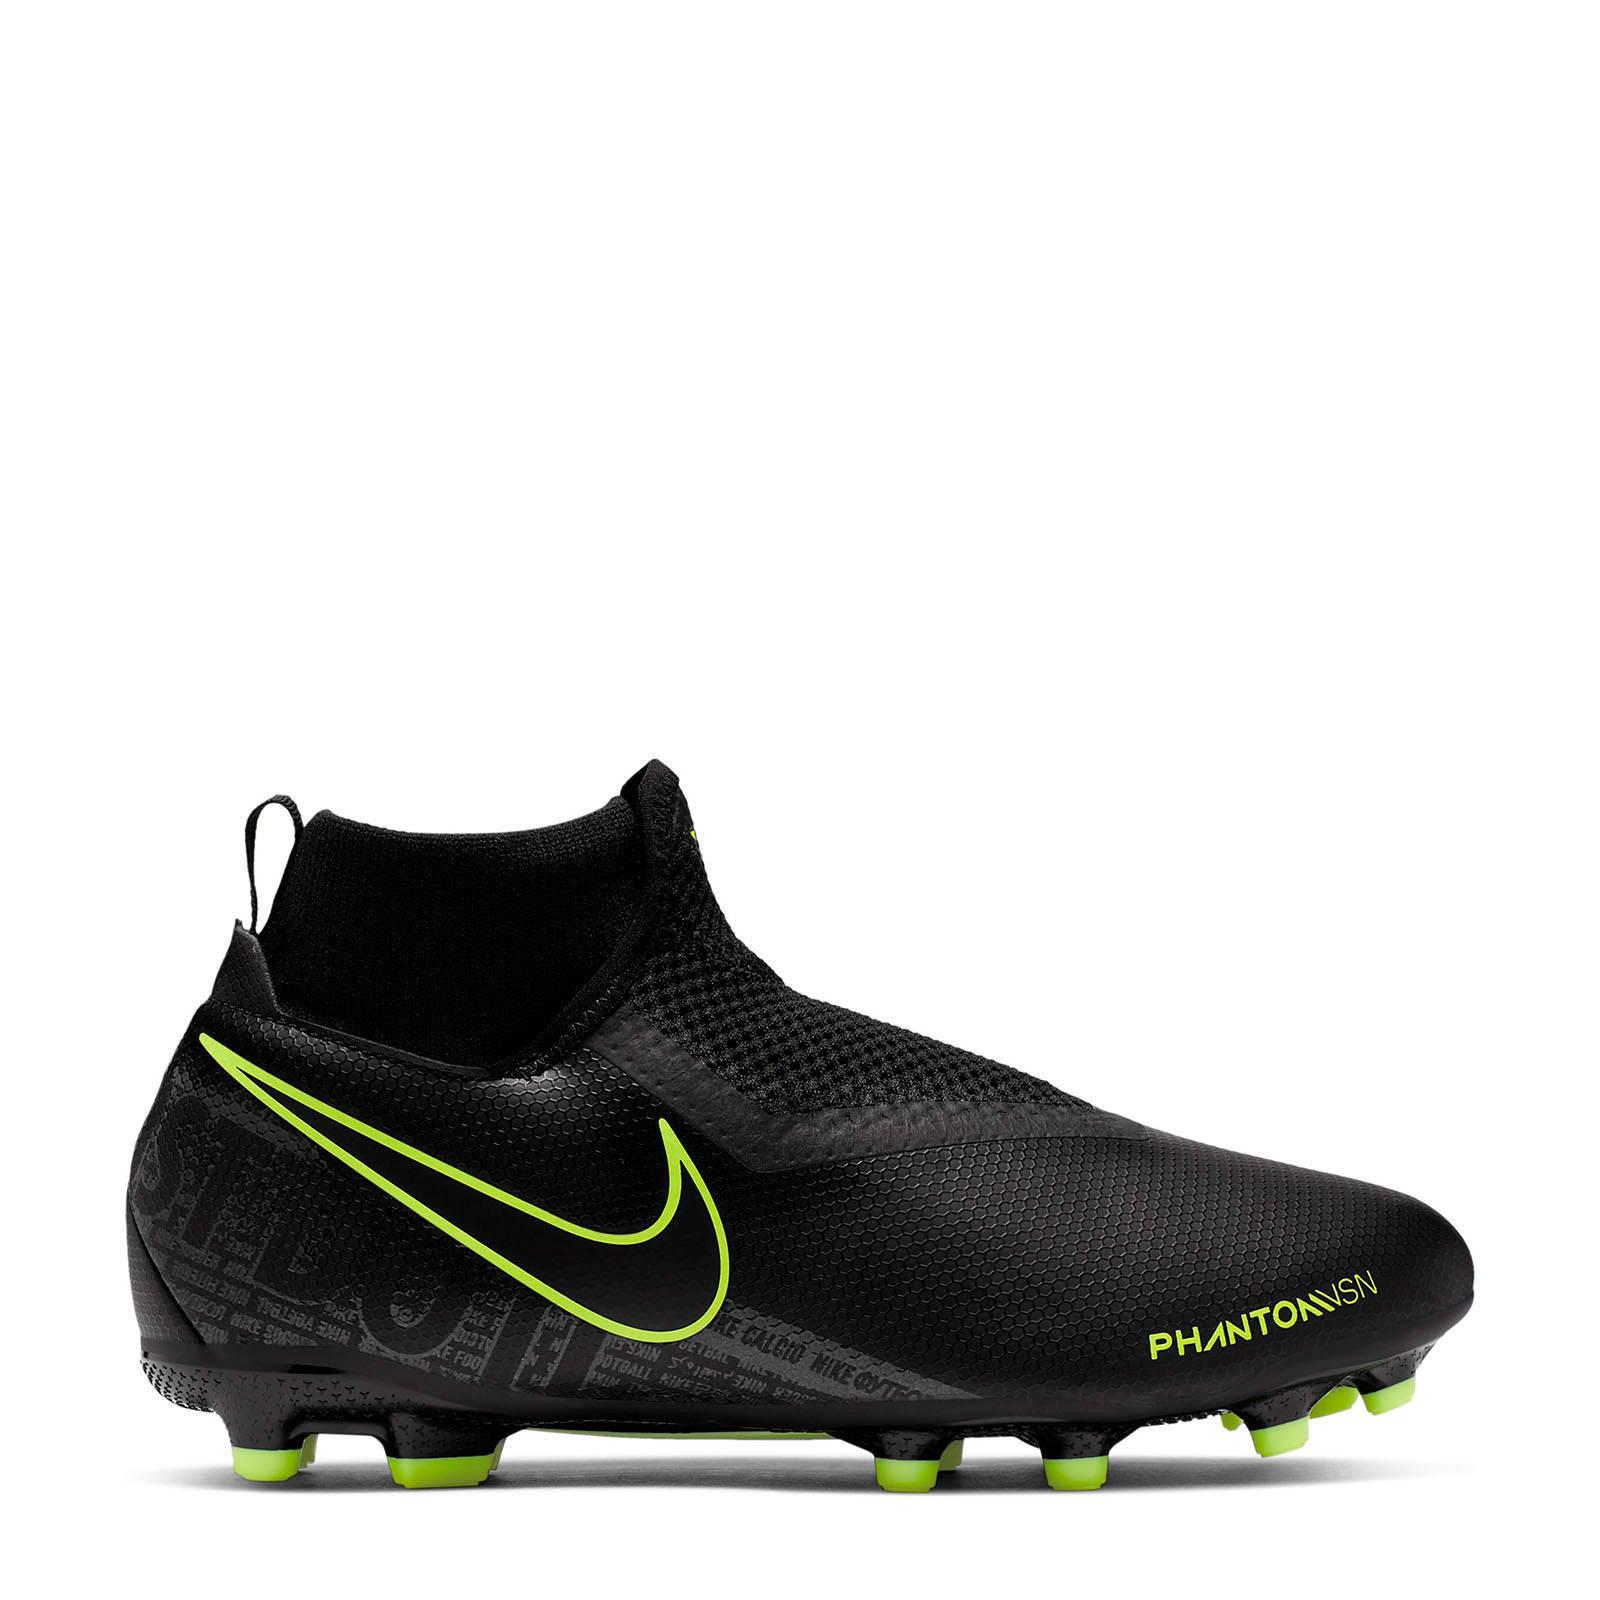 Nike Phantom VSN Academy DF FGMG Jr. voetbalschoenen zwart